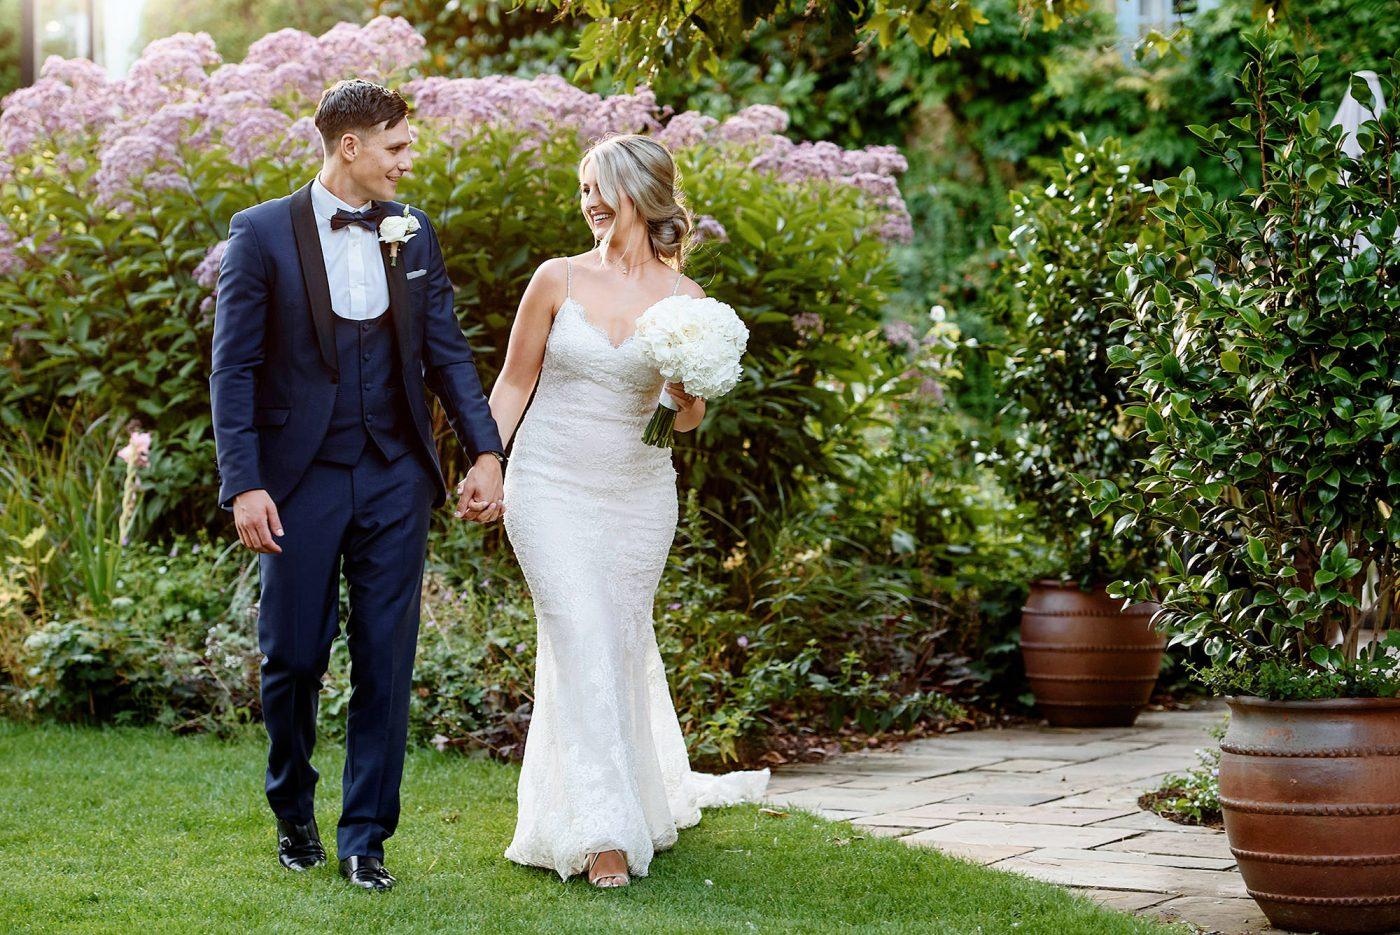 bride and groom walking at hertfordshire wedding venue